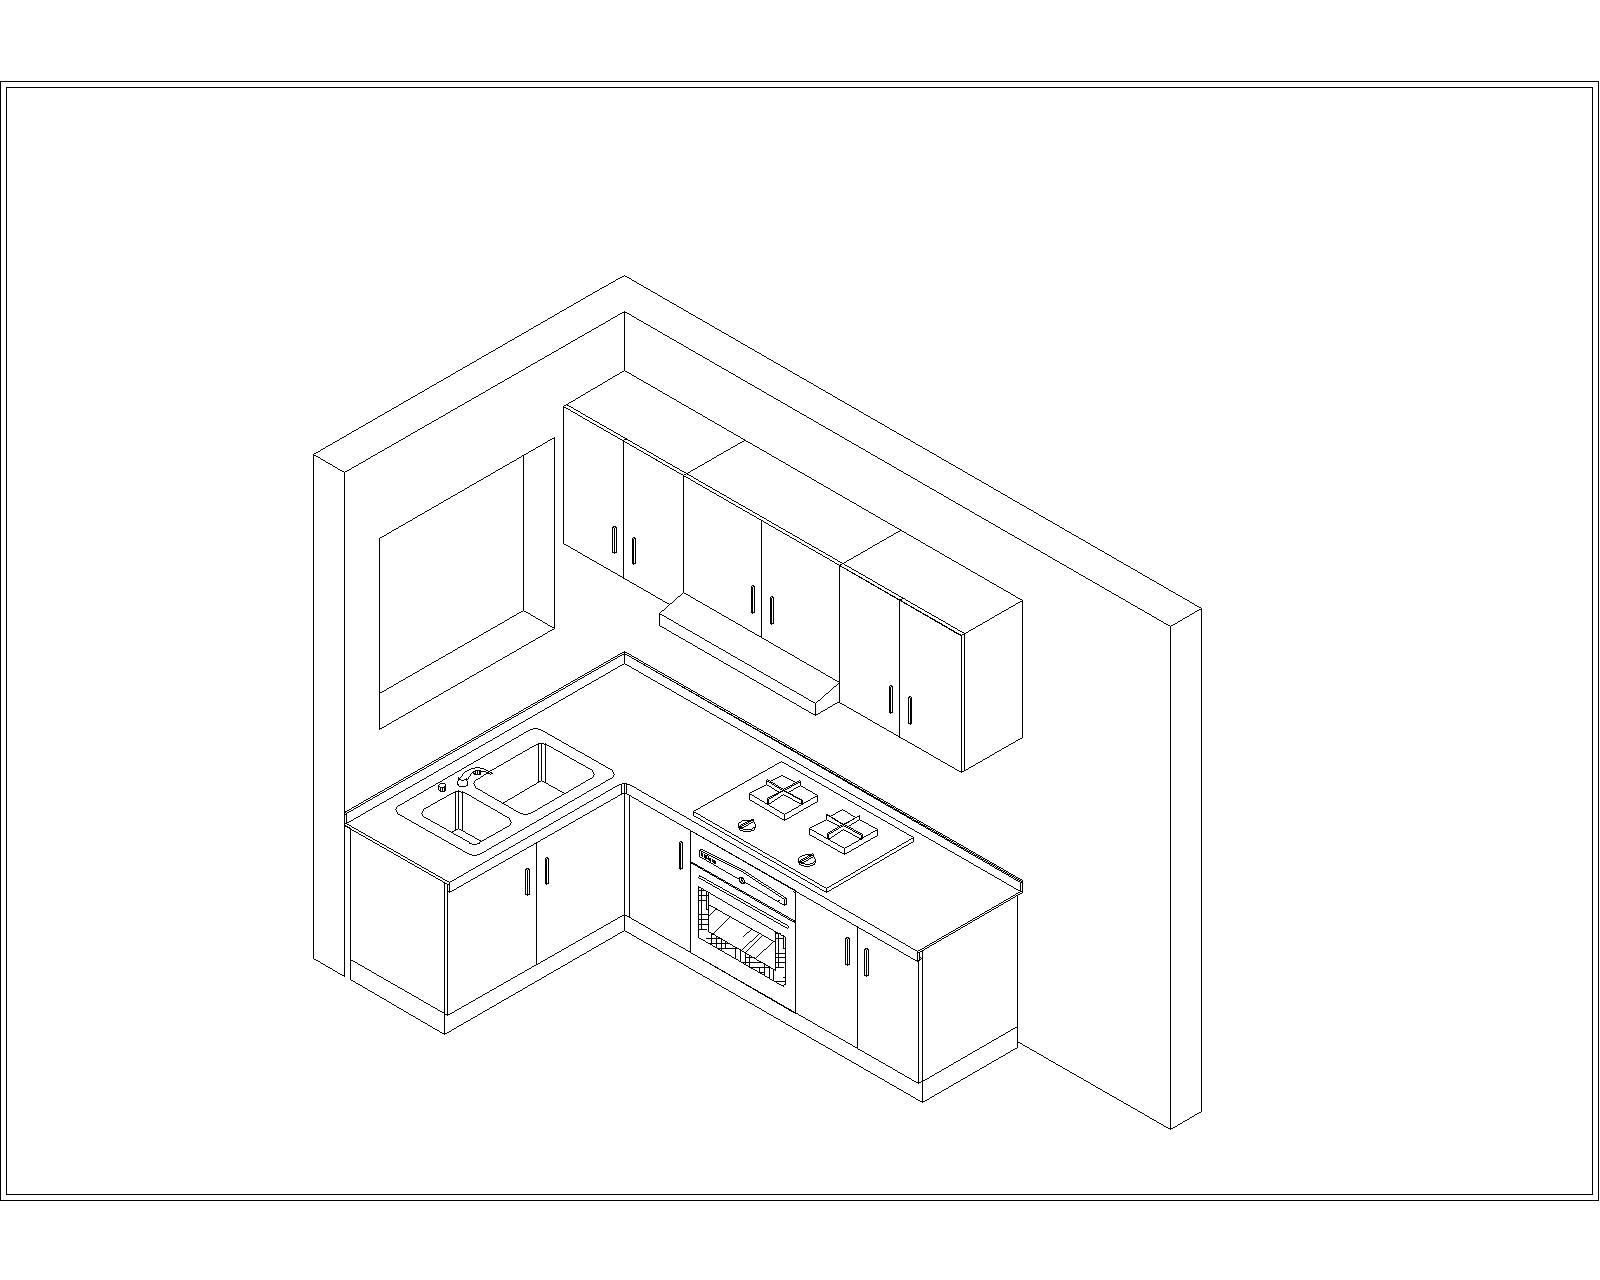 v橱柜橱柜、园地的设计图--自学[51围观网衣柜]内齿圈cad图纸图片